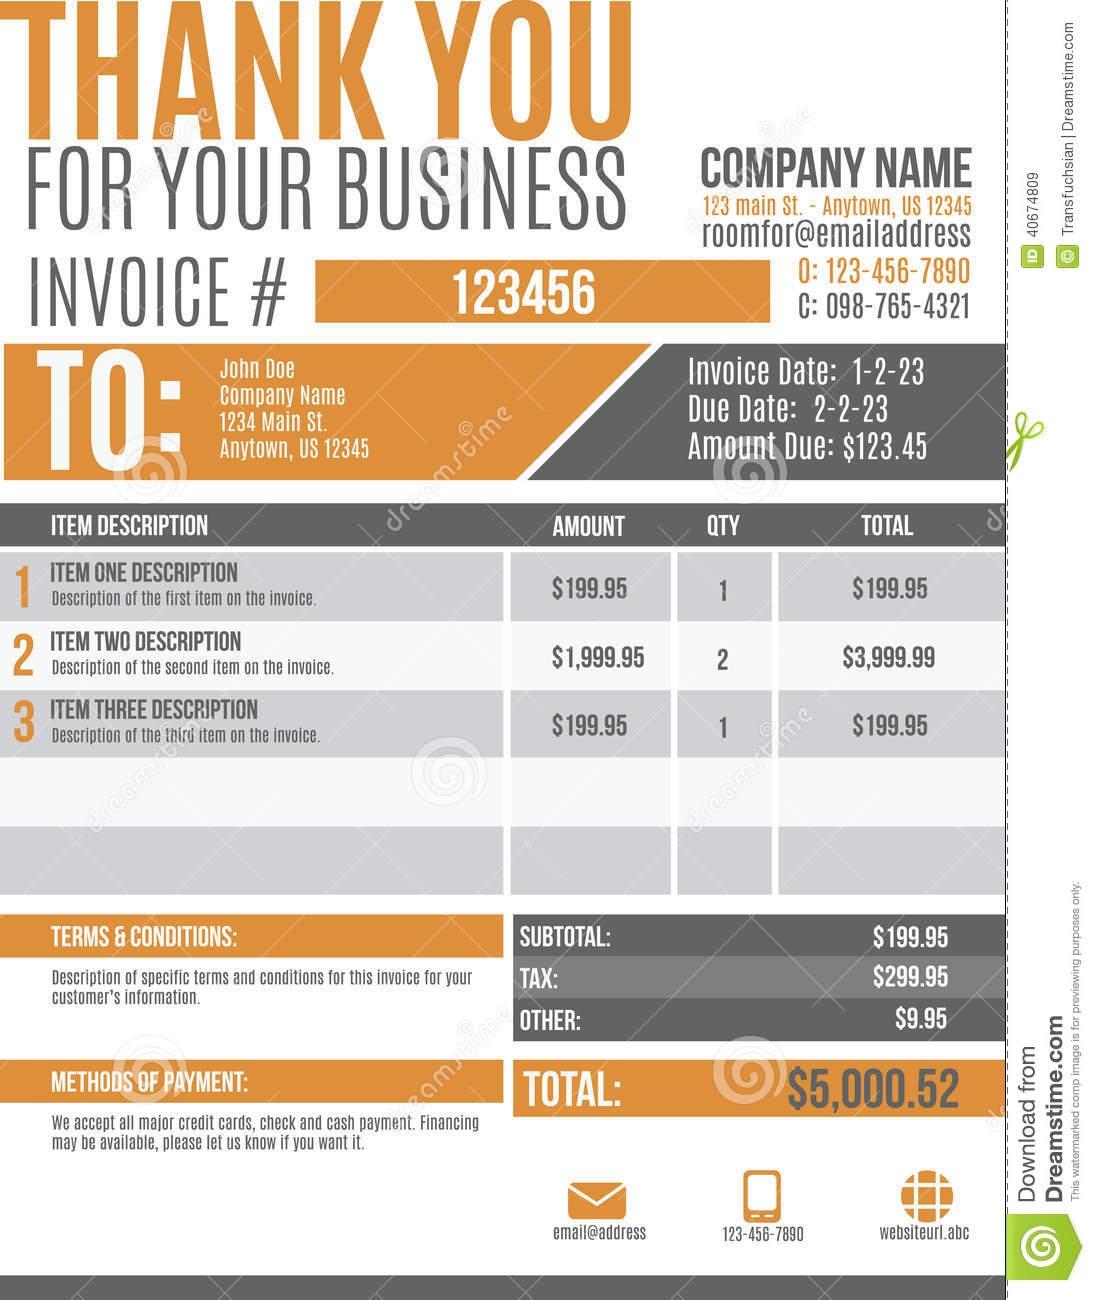 fun invoice template design stock vector image 40674809 modern invoice template